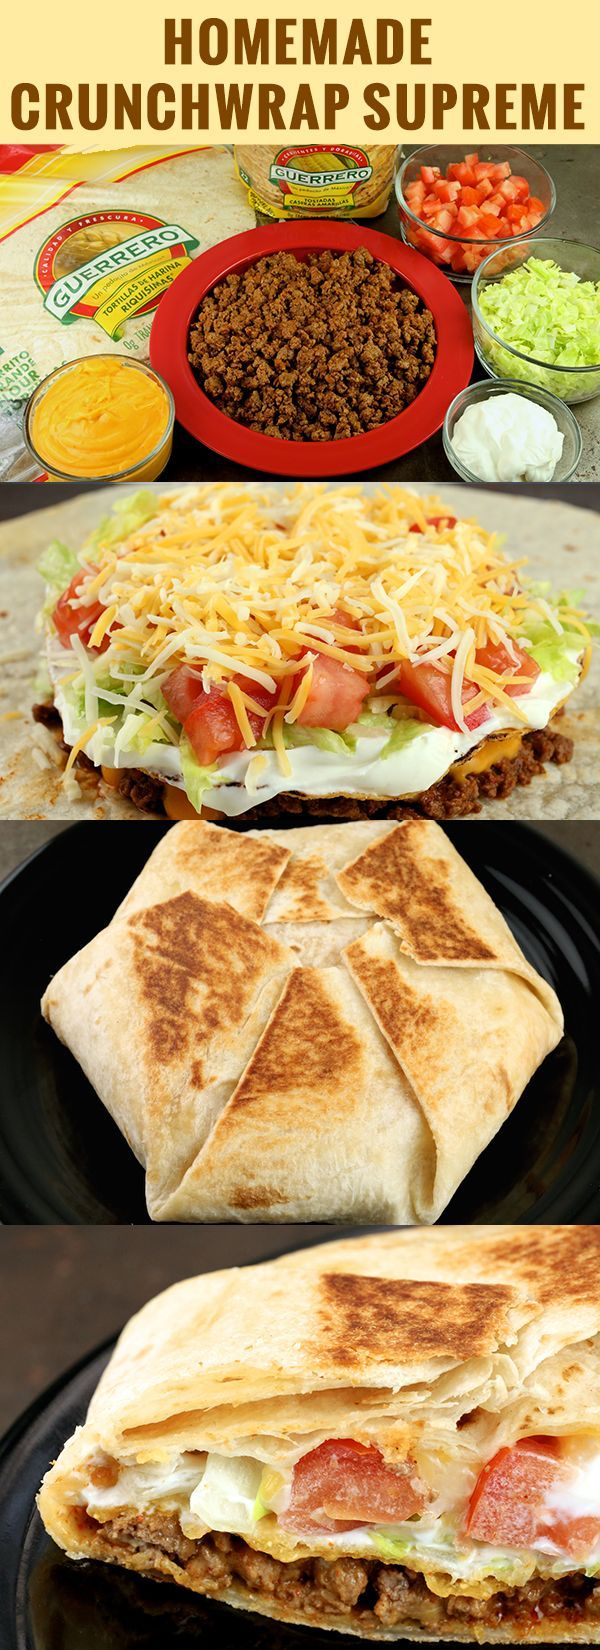 Photo of Homemade Crunchwrap Supreme Recipe #mexican food Homemade Crunchwrap Supreme Rec…